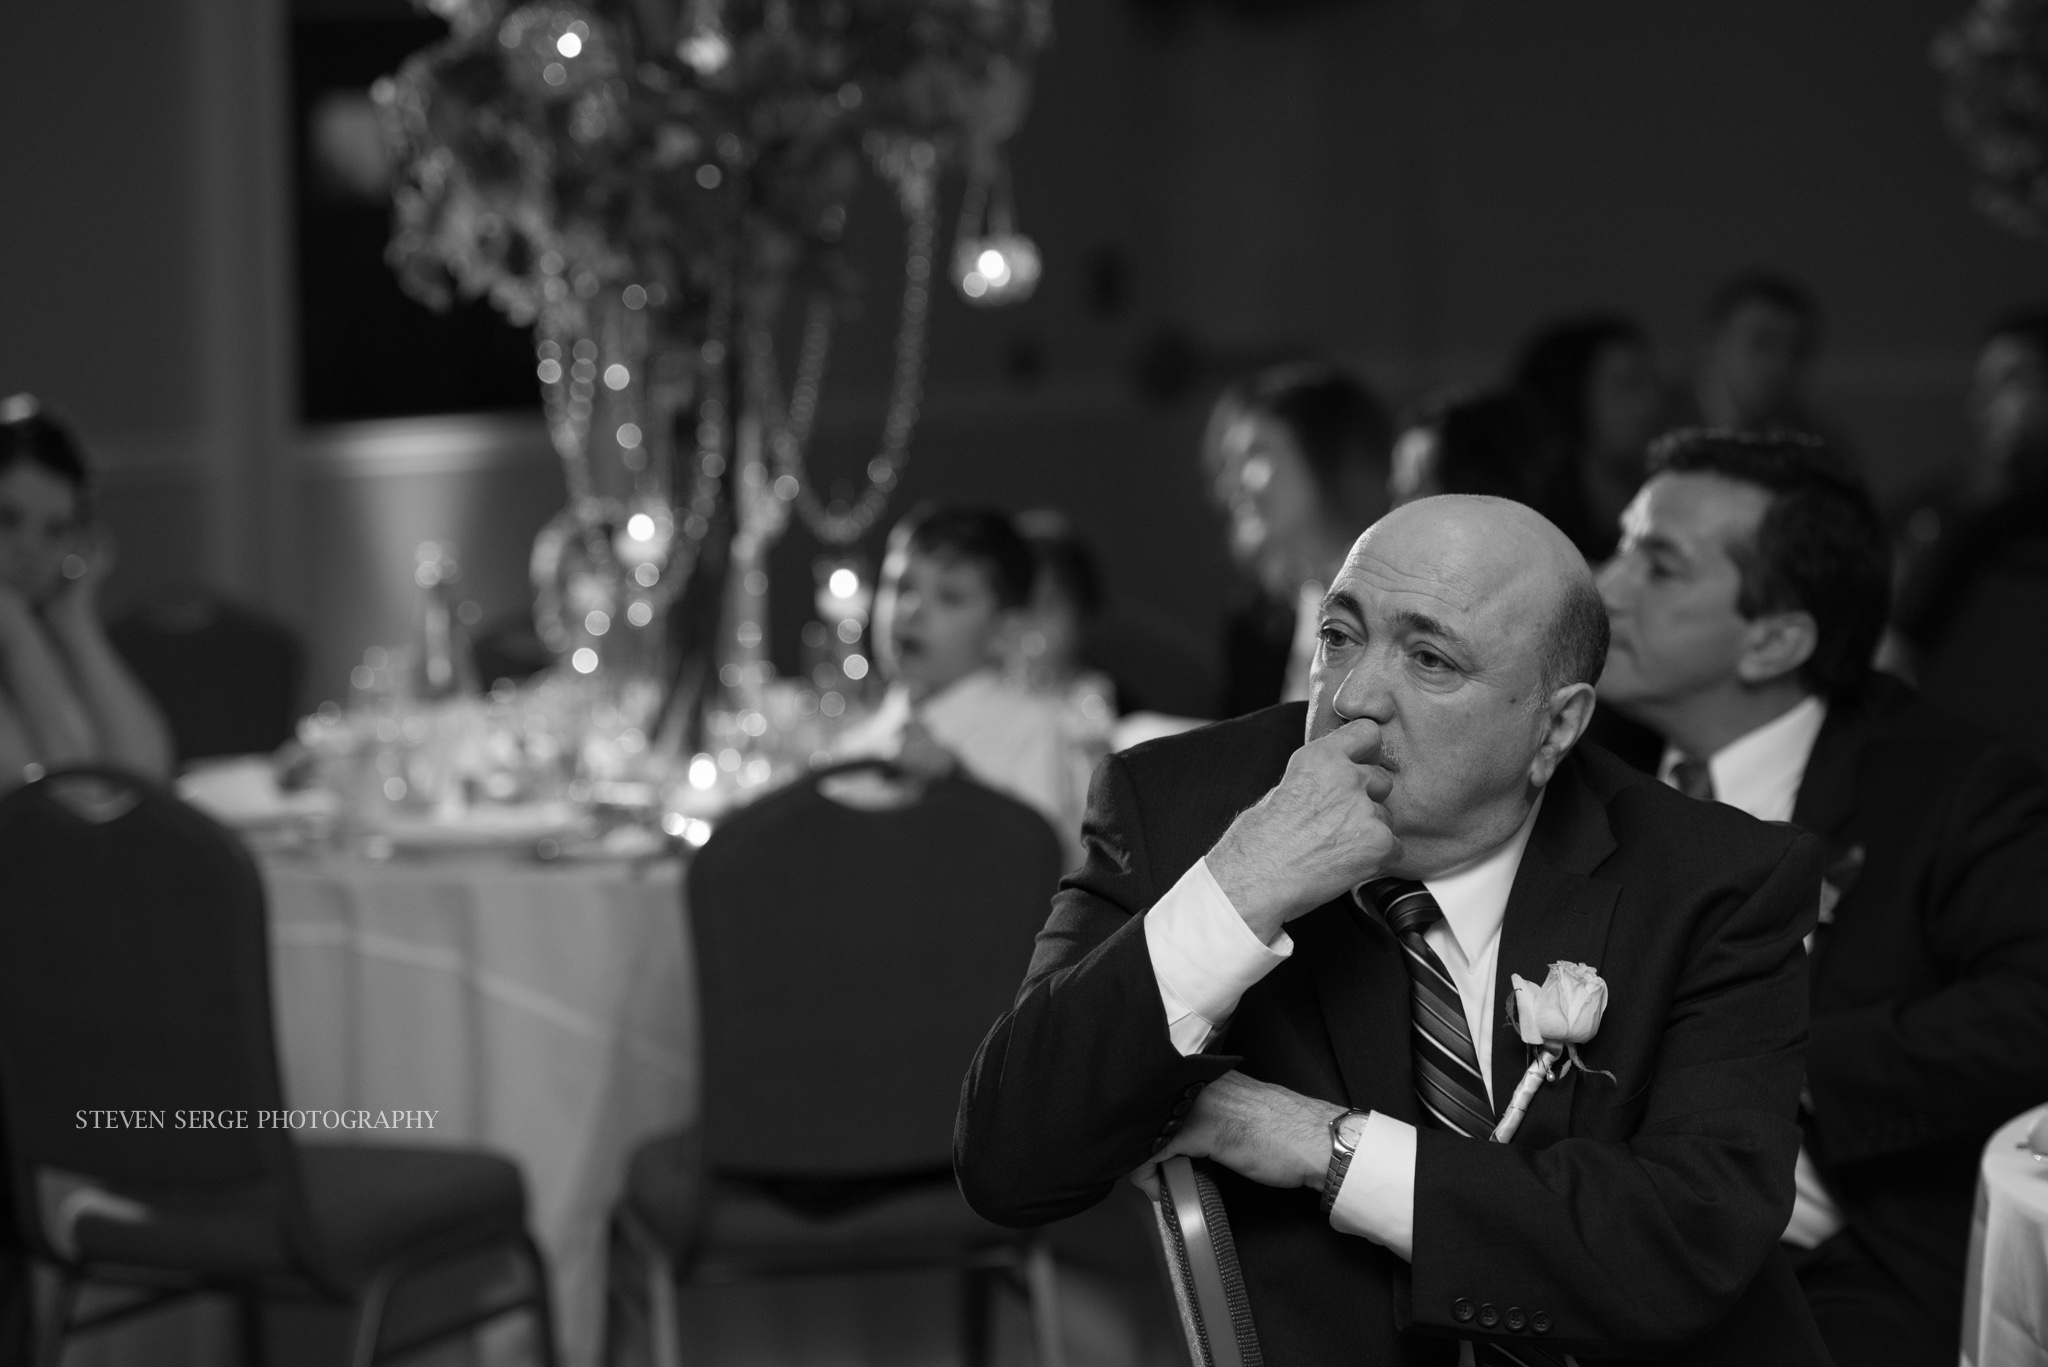 Scranton-wedding-photographer-fiorellis-steven-serge-41.jpg